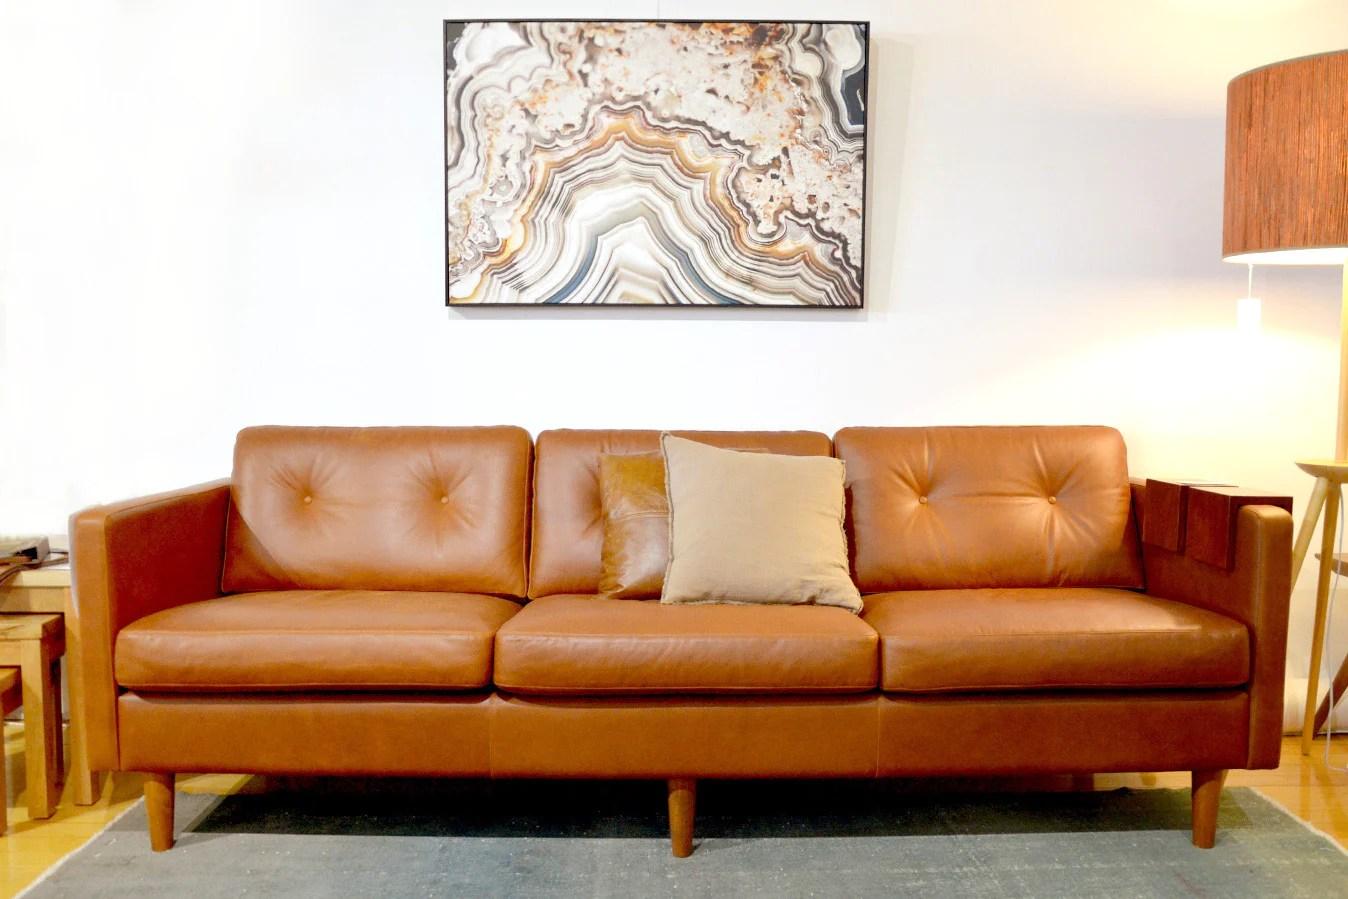 century furniture sofa quality e colchoes trackid sp 006 svensen retro mid aniline leather couch bespoke scandinavian design tan perth wa